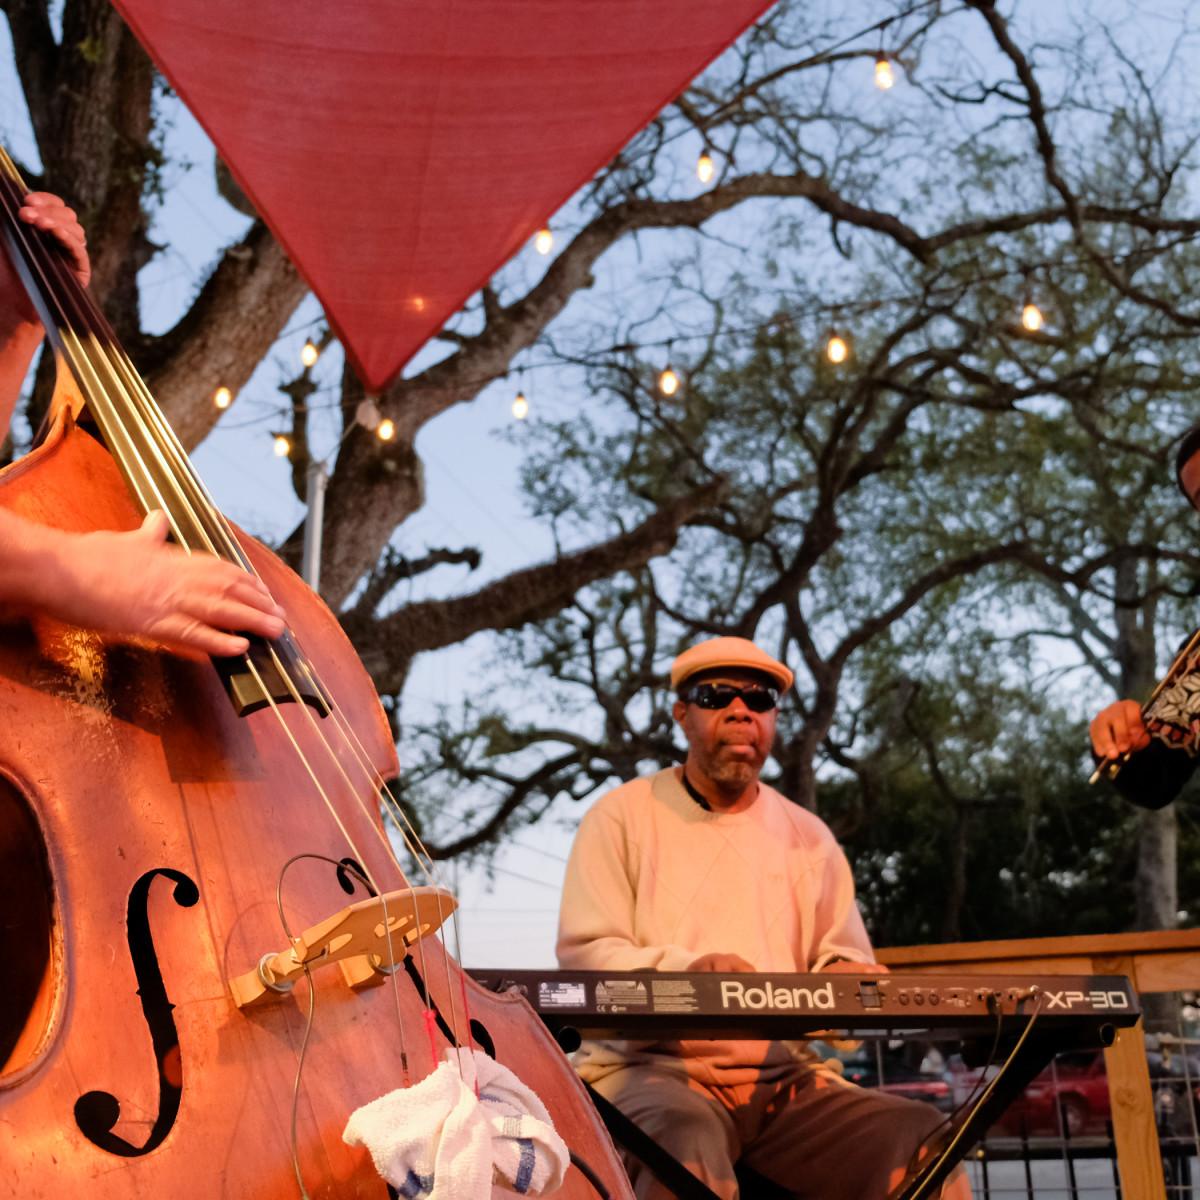 Rikenjaks musicians in Lake Charles, Louisiana